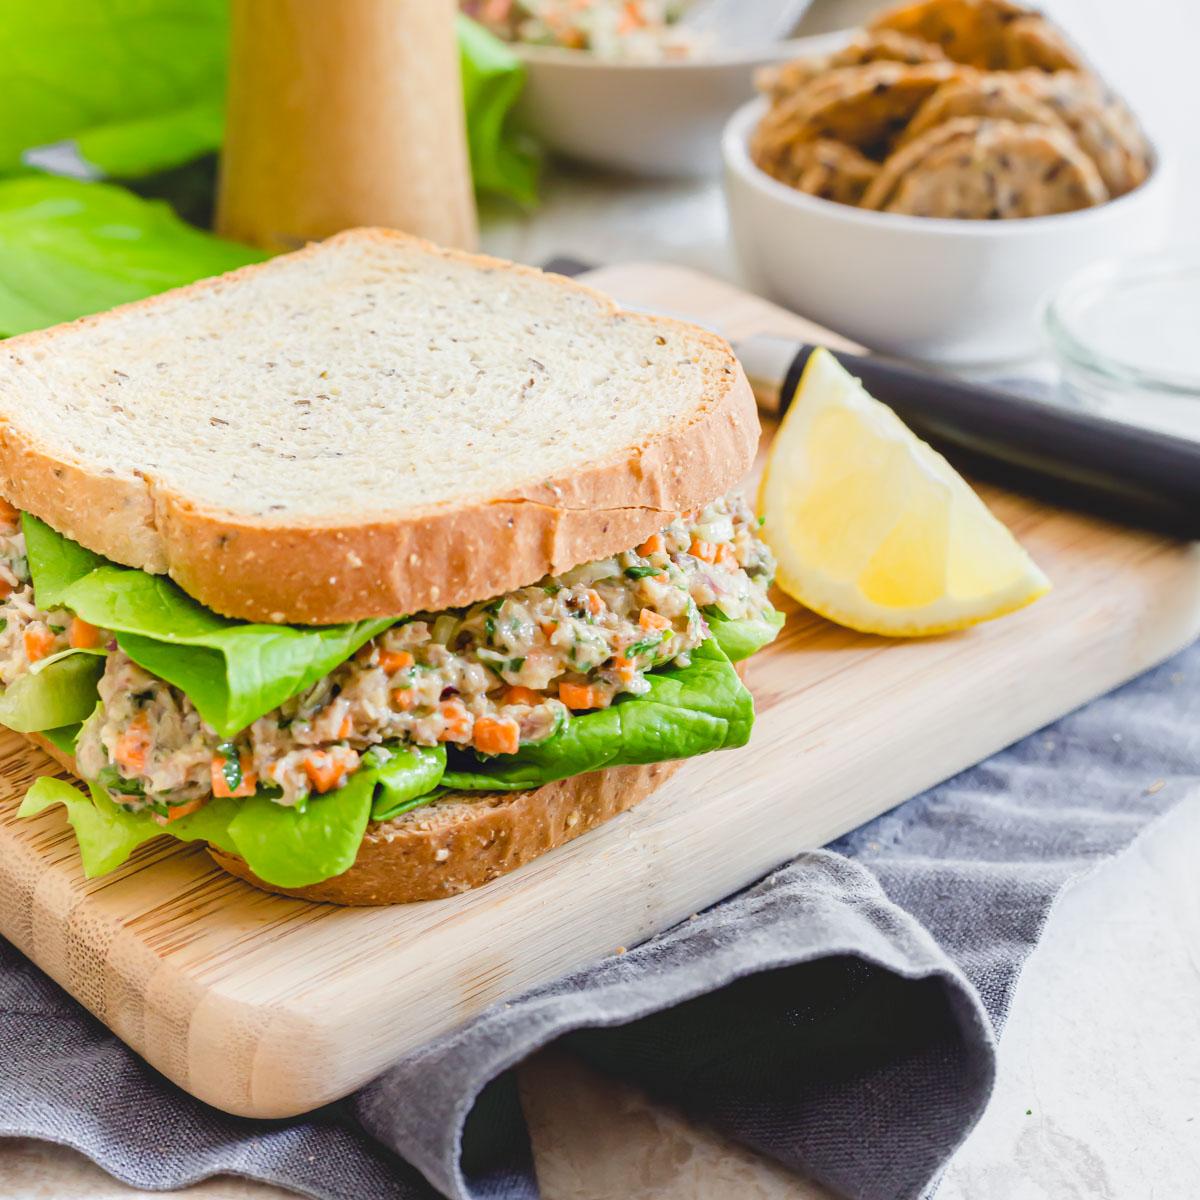 Sardine salad sandwich on gluten-free bread with fresh Bibb lettuce.